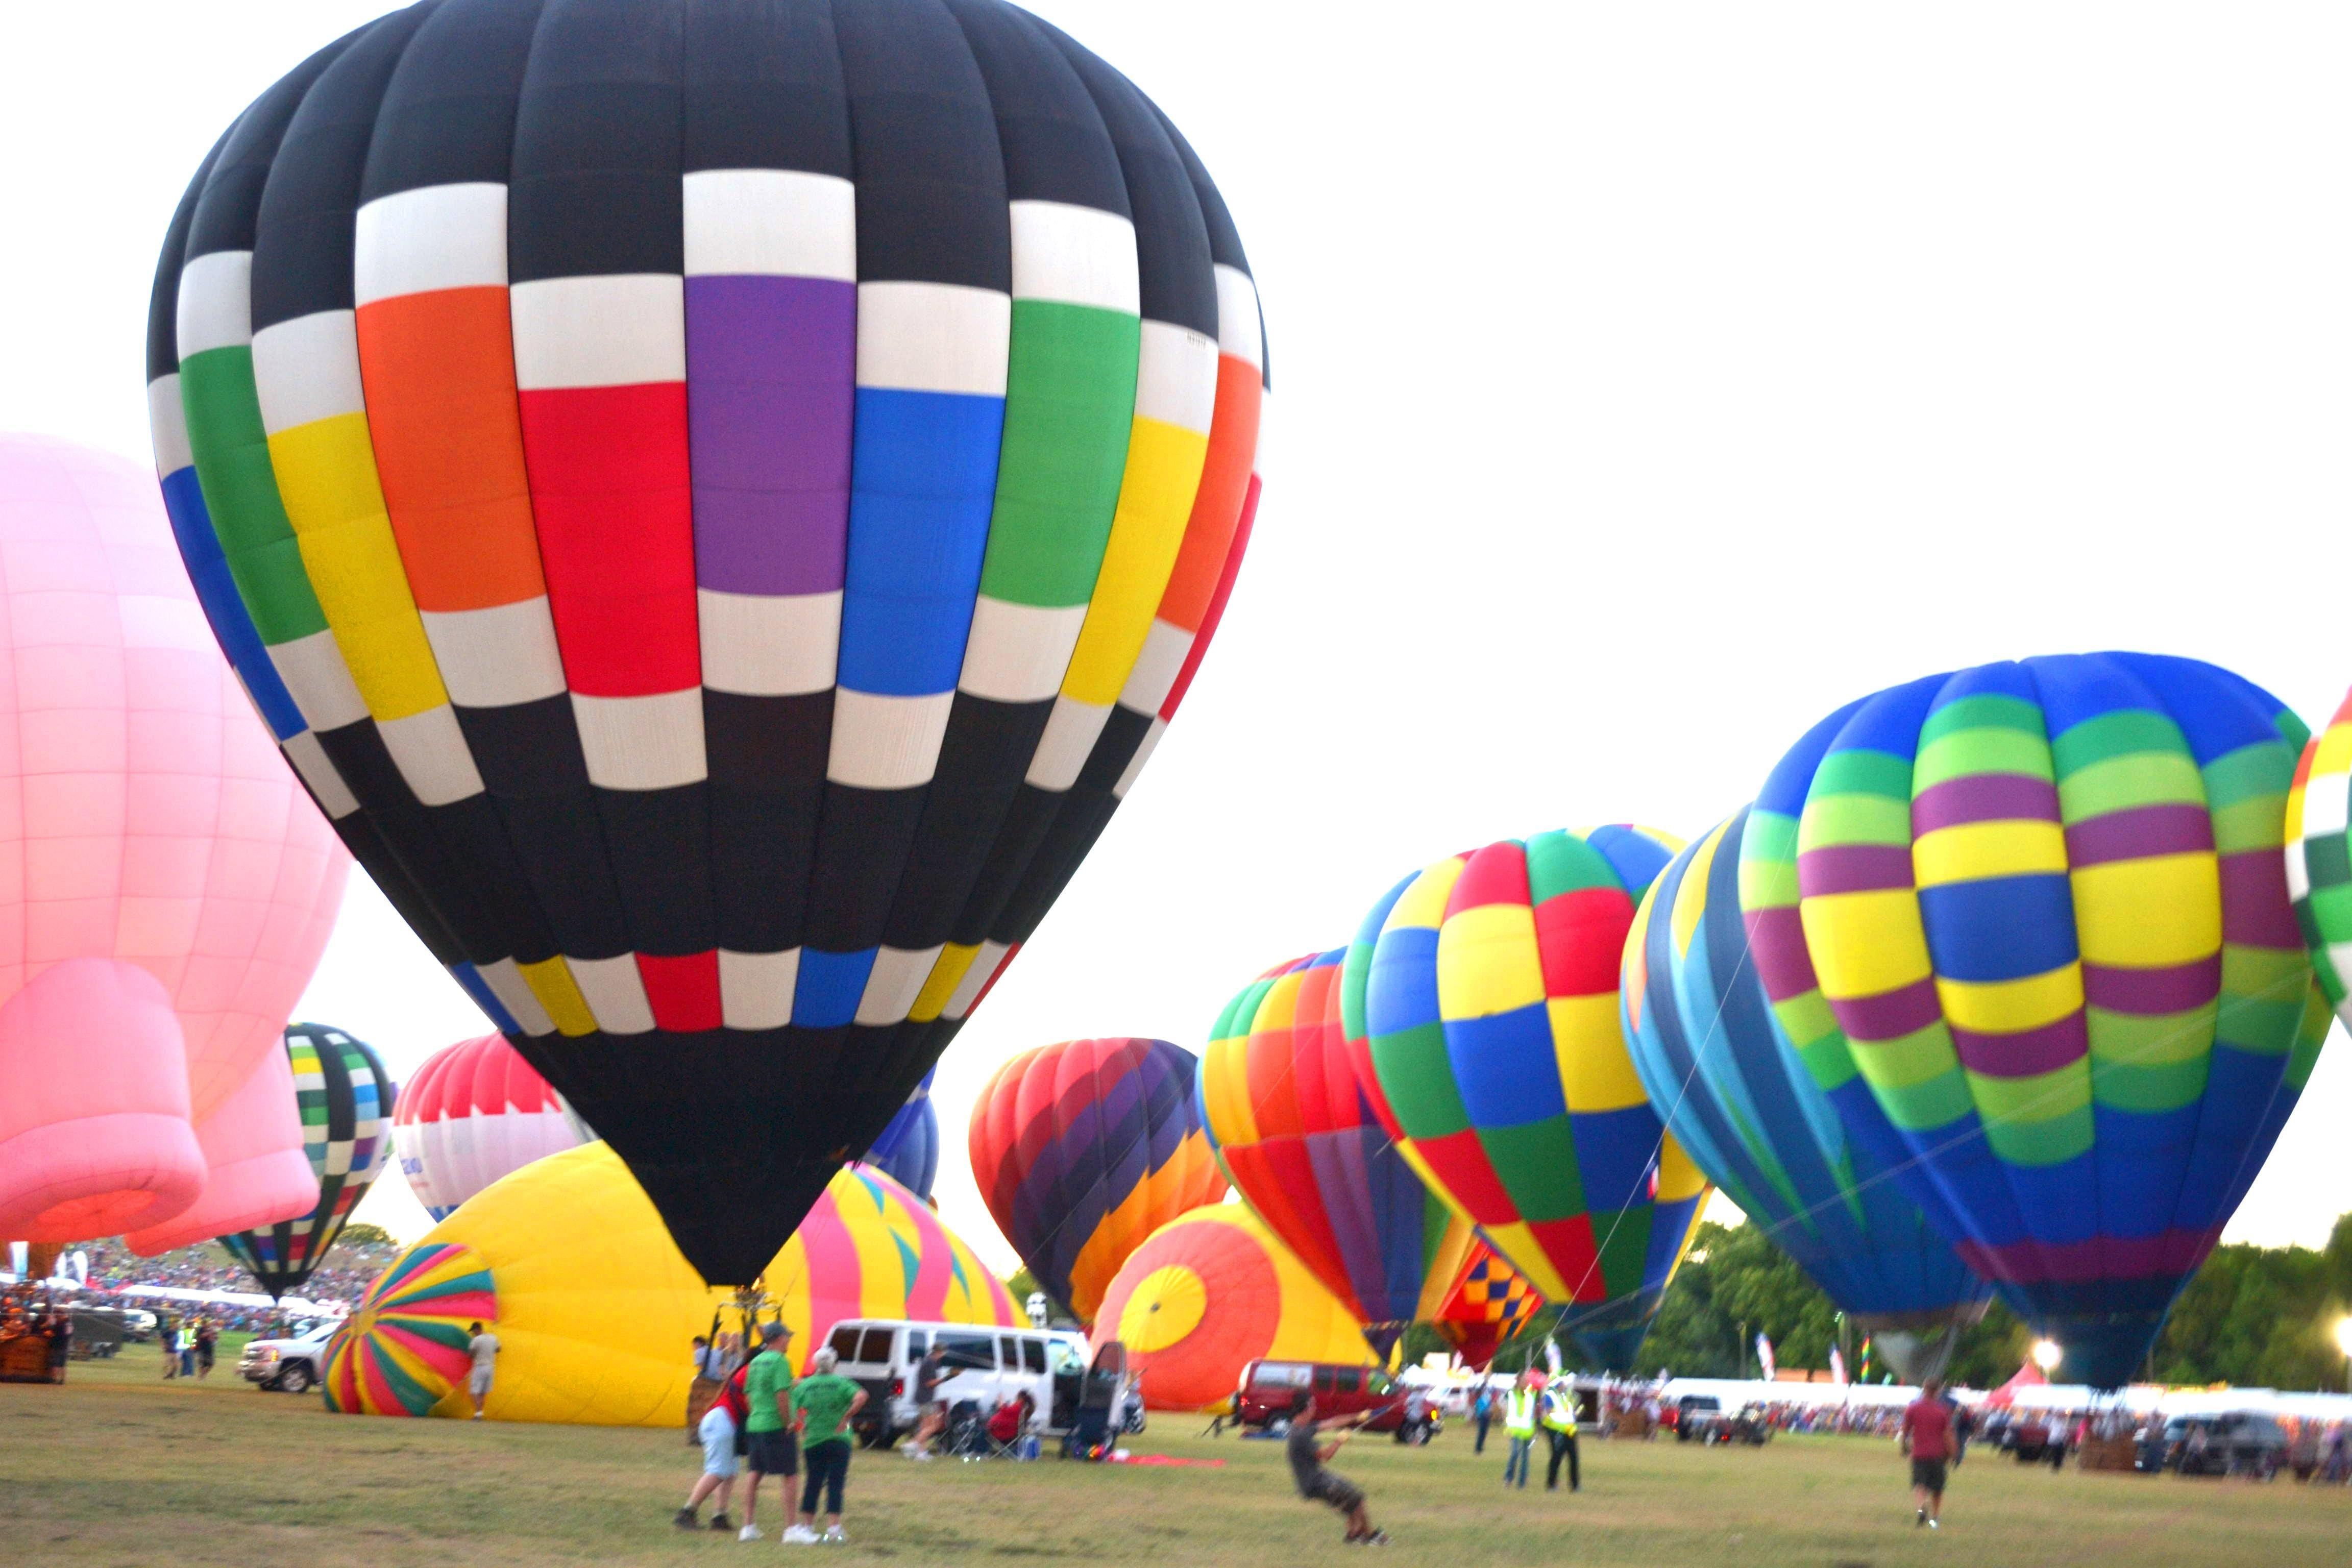 Chameleon hot air balloon will be flown by pilot David